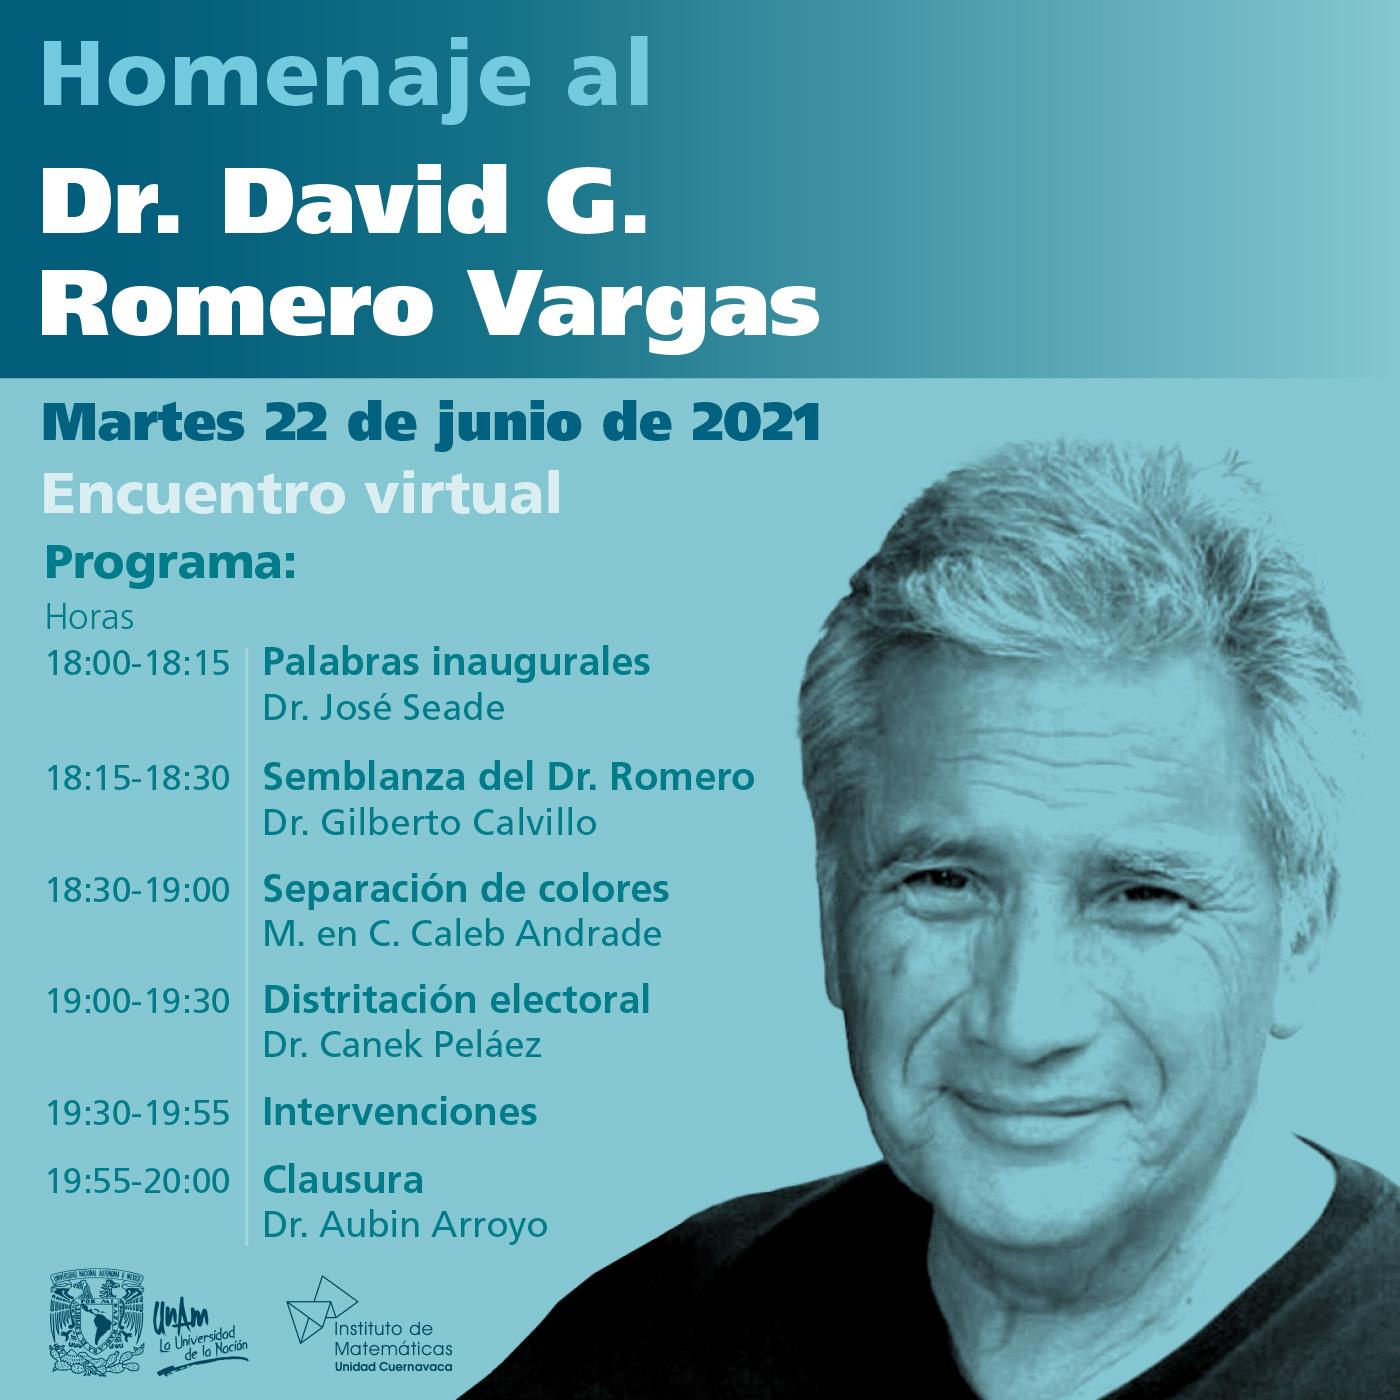 Homenaje al Dr. David G. Romero Vargas